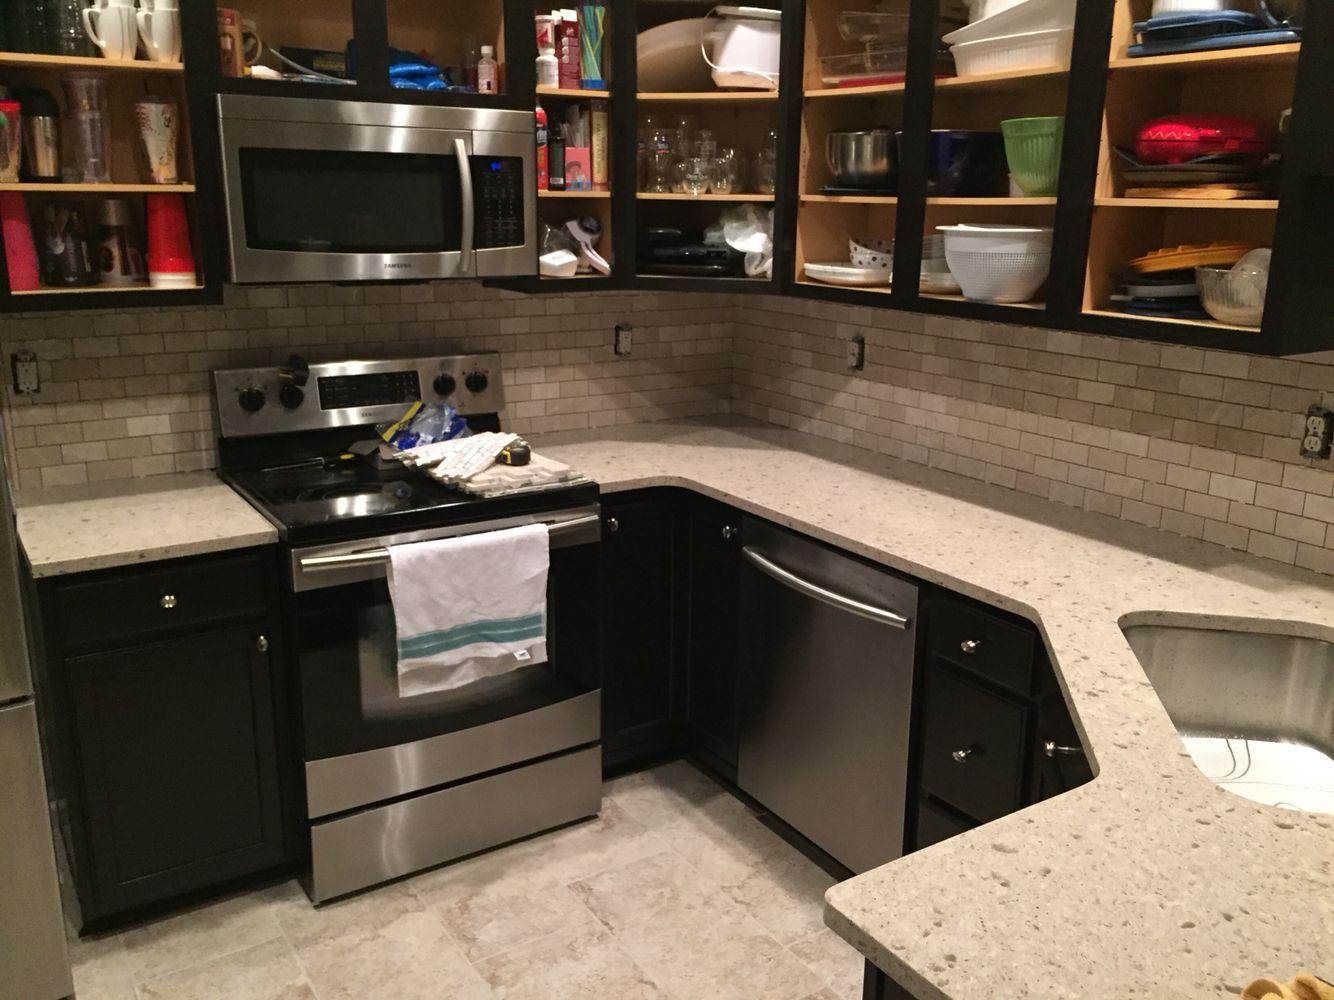 Marble backsplash full kitchen remodel kitchen remodel